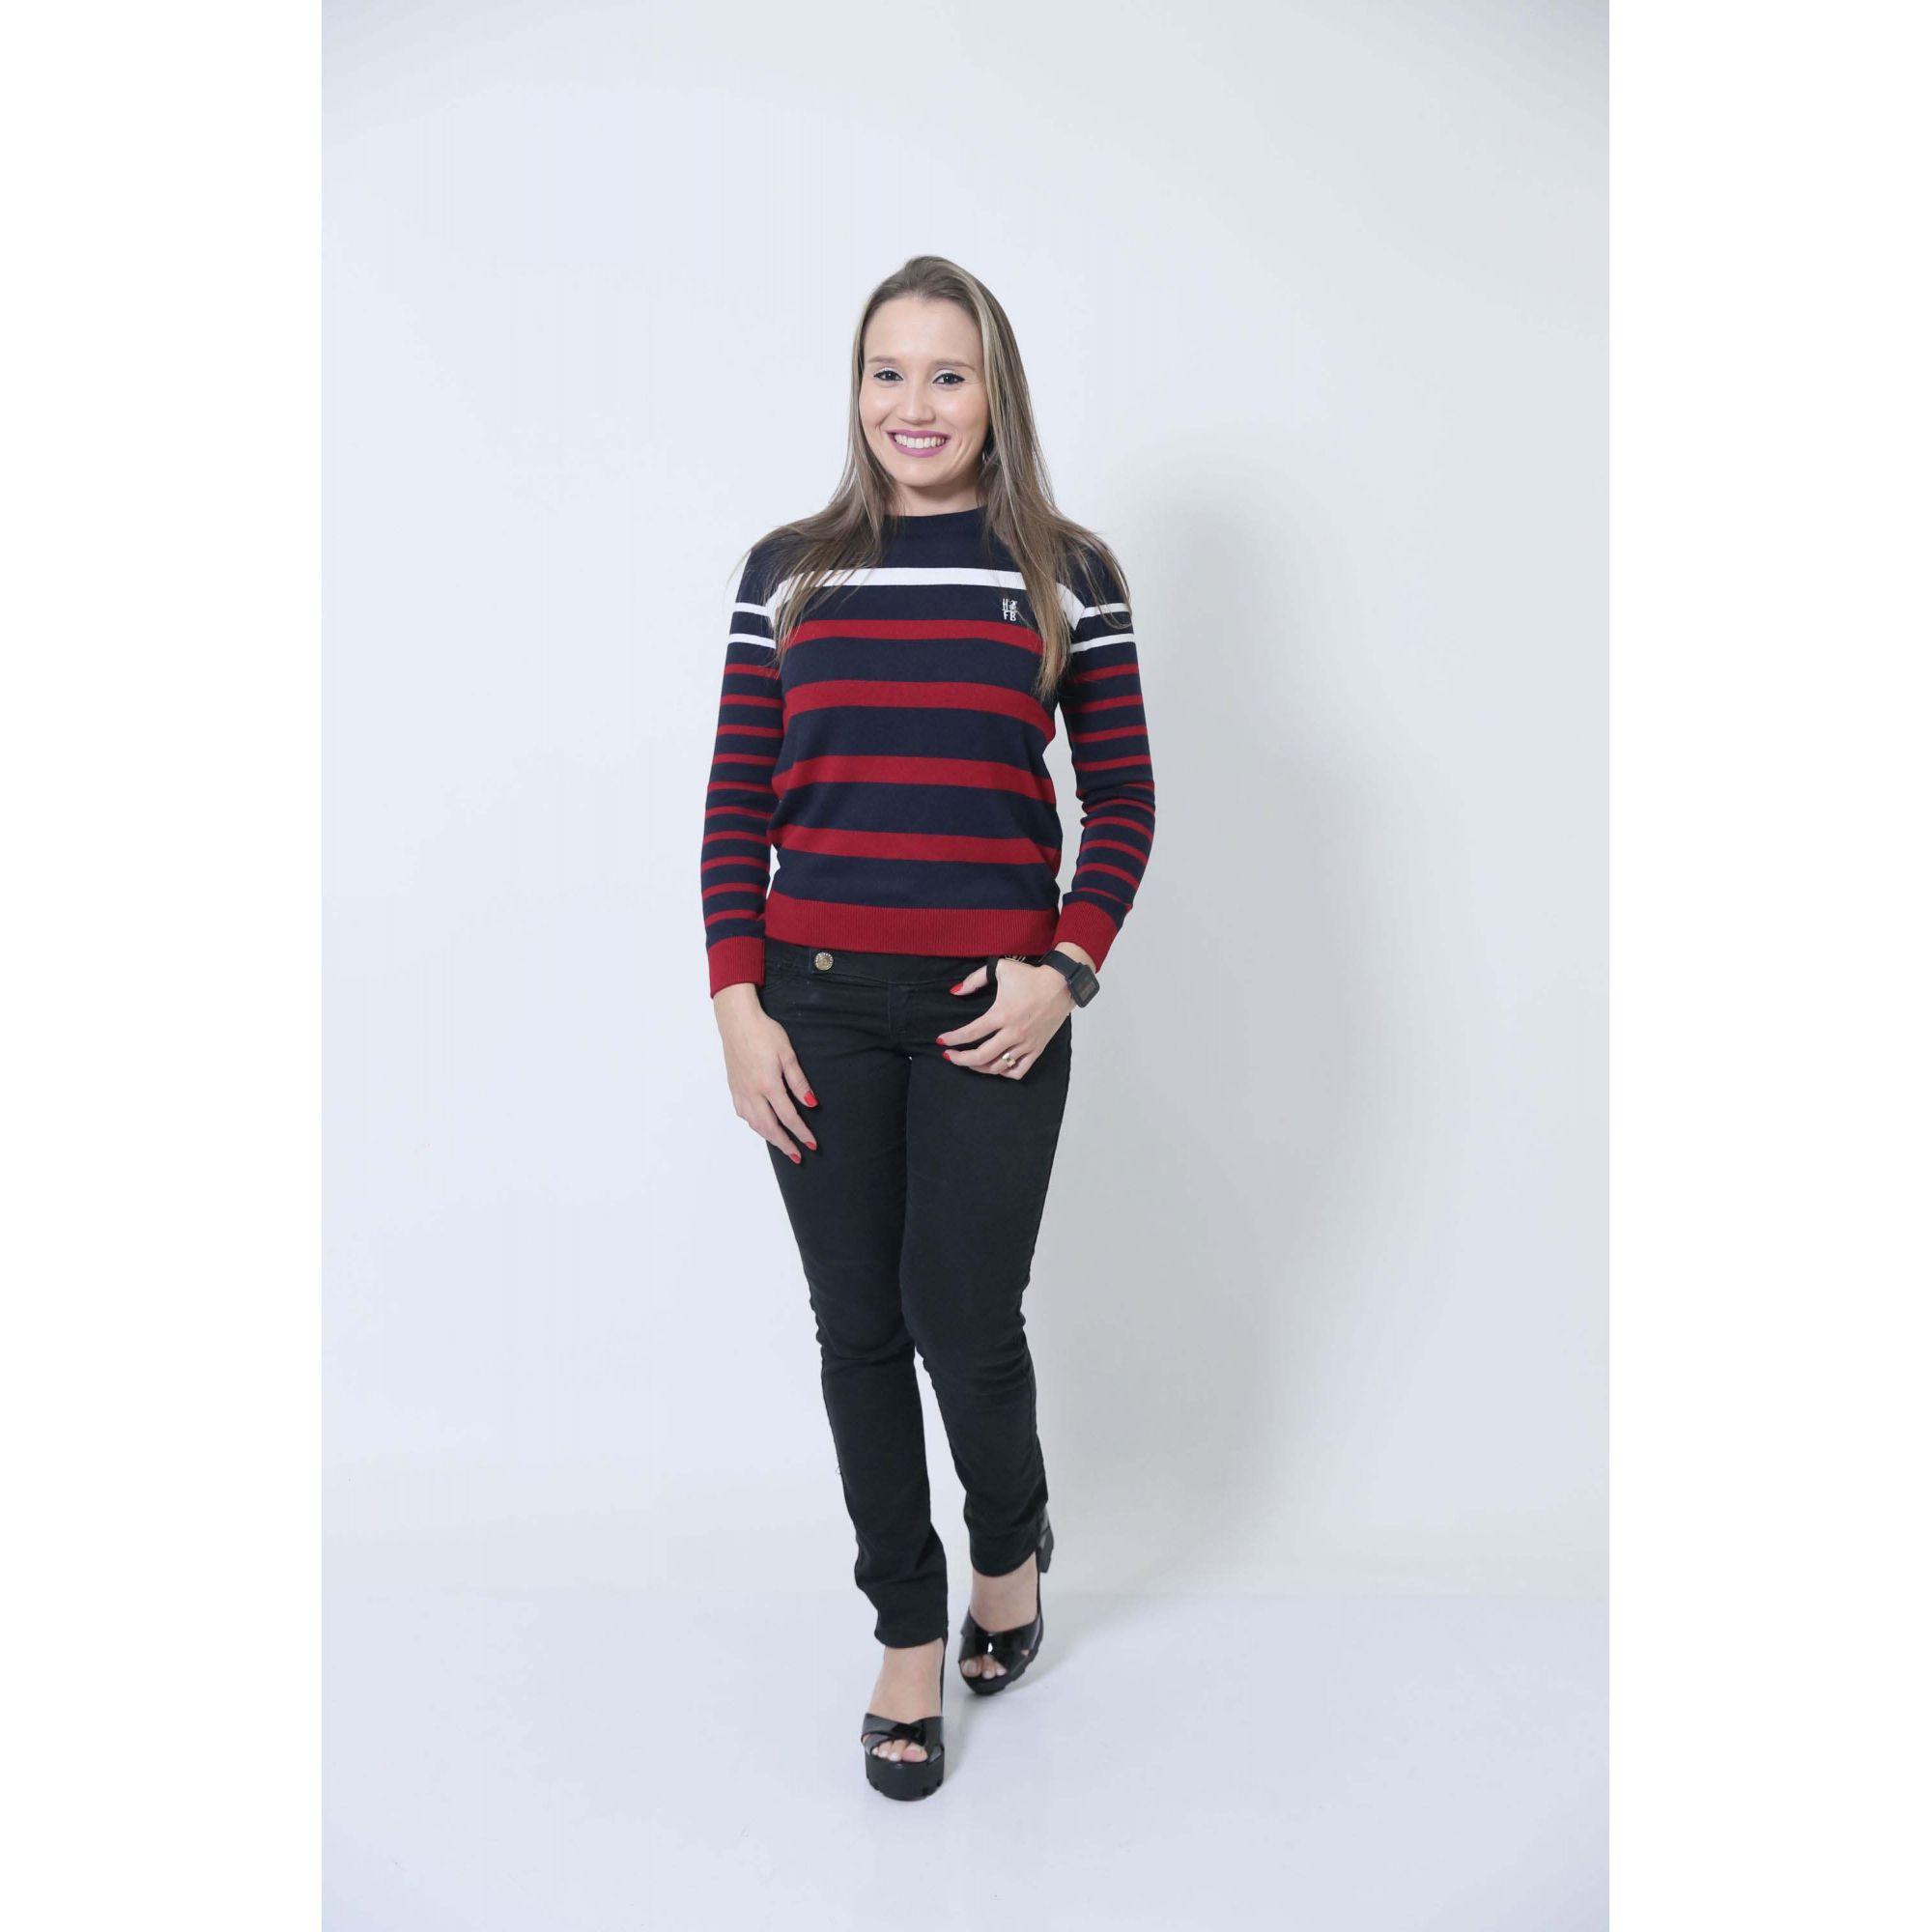 MÃE E FILHO > Kit 02 Blusas Suéter Listrado [Coleção Tal Mãe Tal Filho]  - Heitor Fashion Brazil